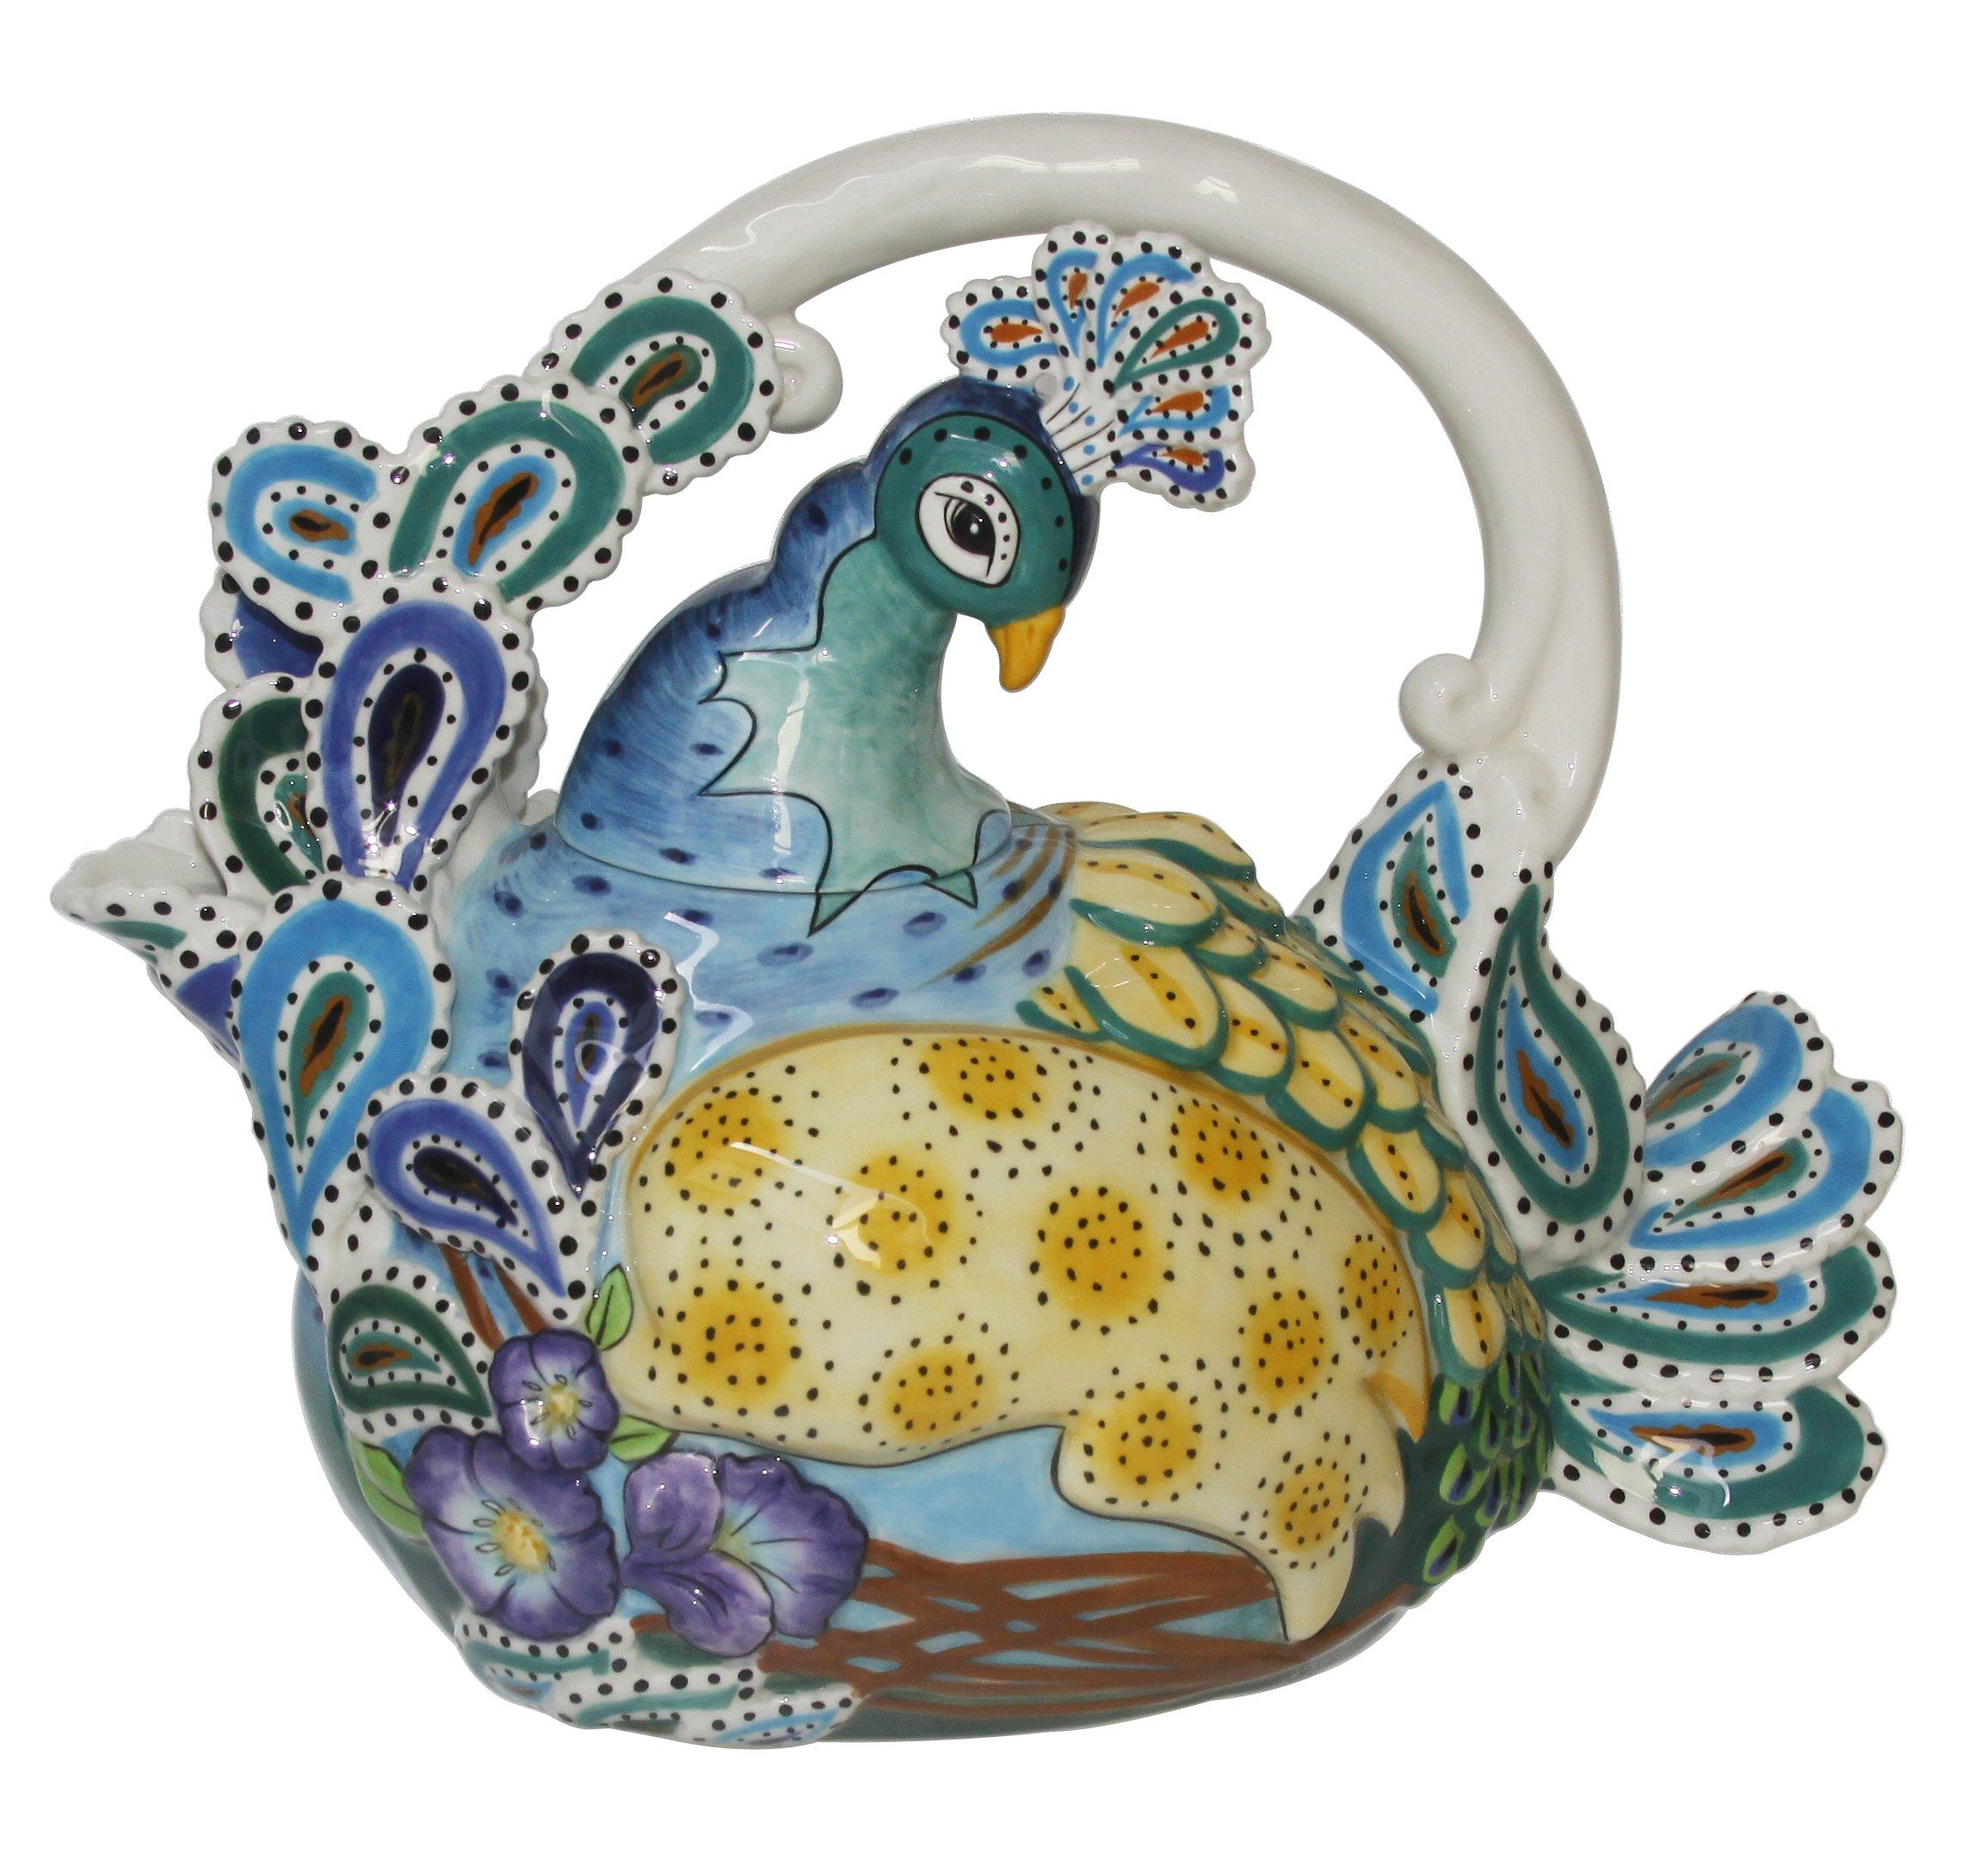 Blue Sky Ceramic Peacock Teapot, 10.5 x 6 x 9'', Blue